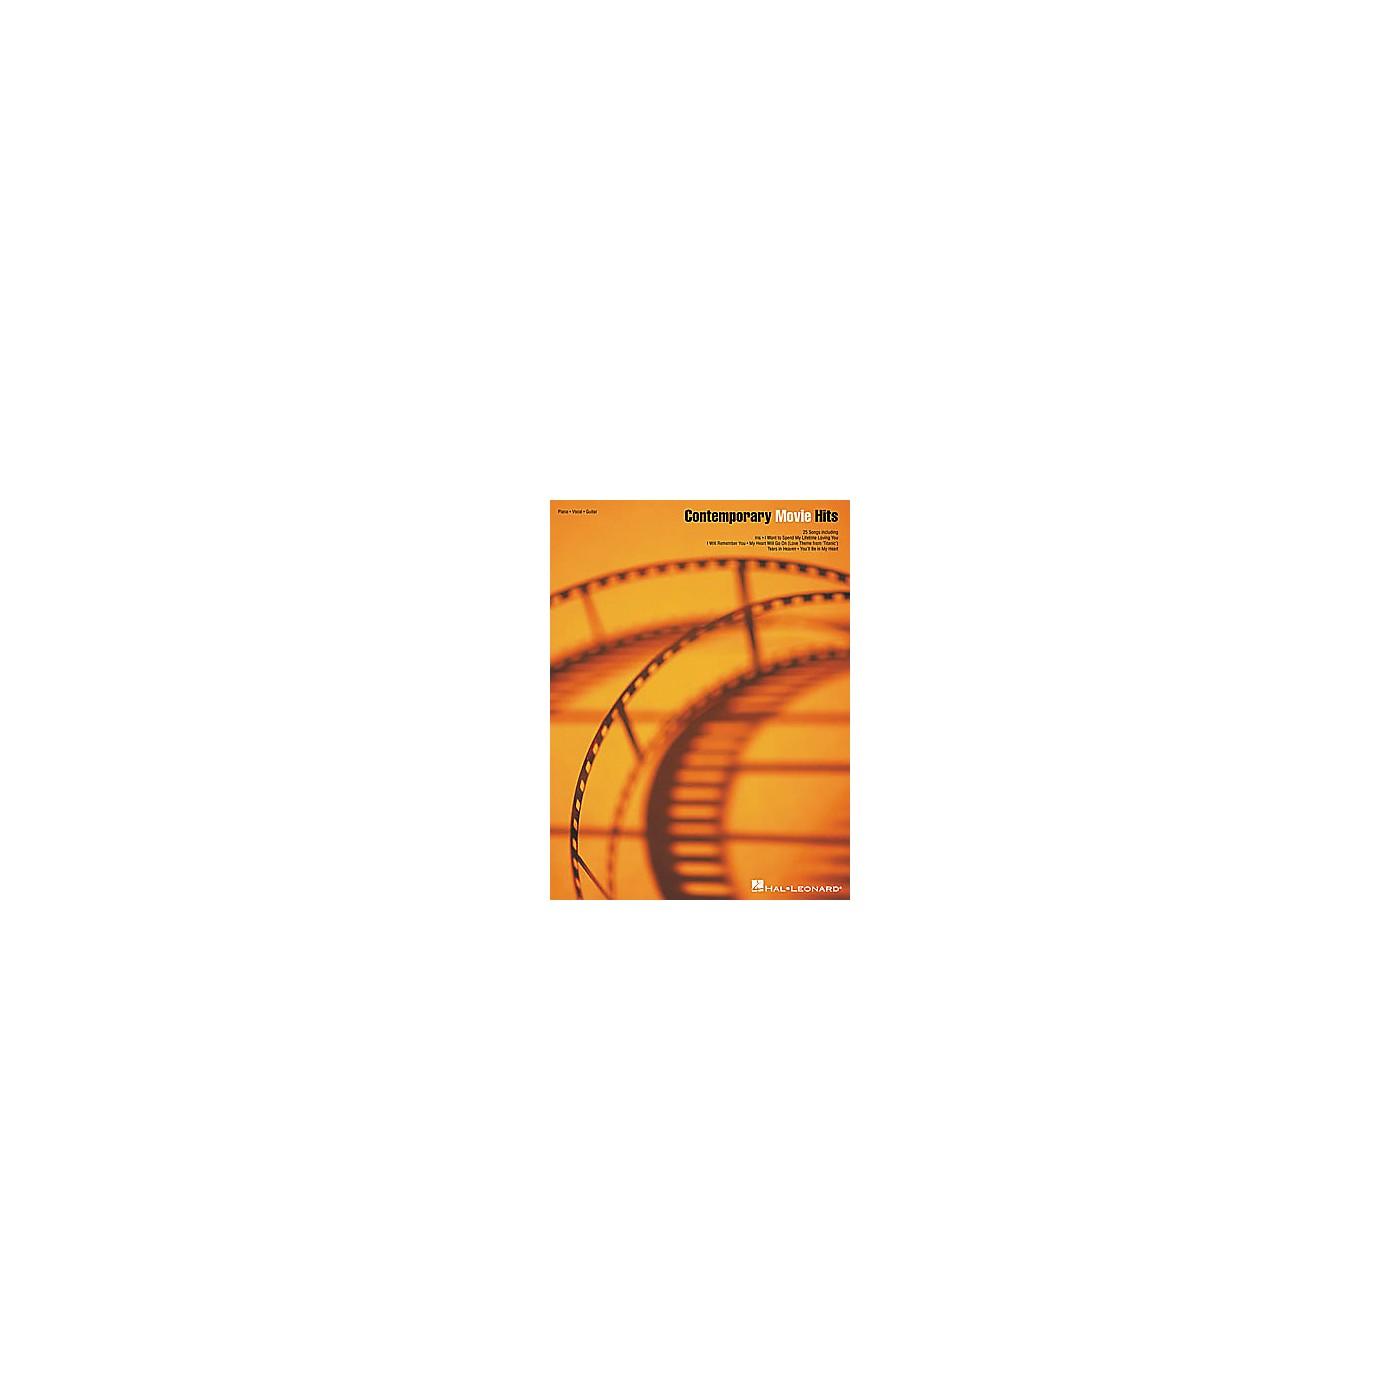 Hal Leonard Contemporary Movie Hits Piano, Vocal, Guitar Songbook thumbnail